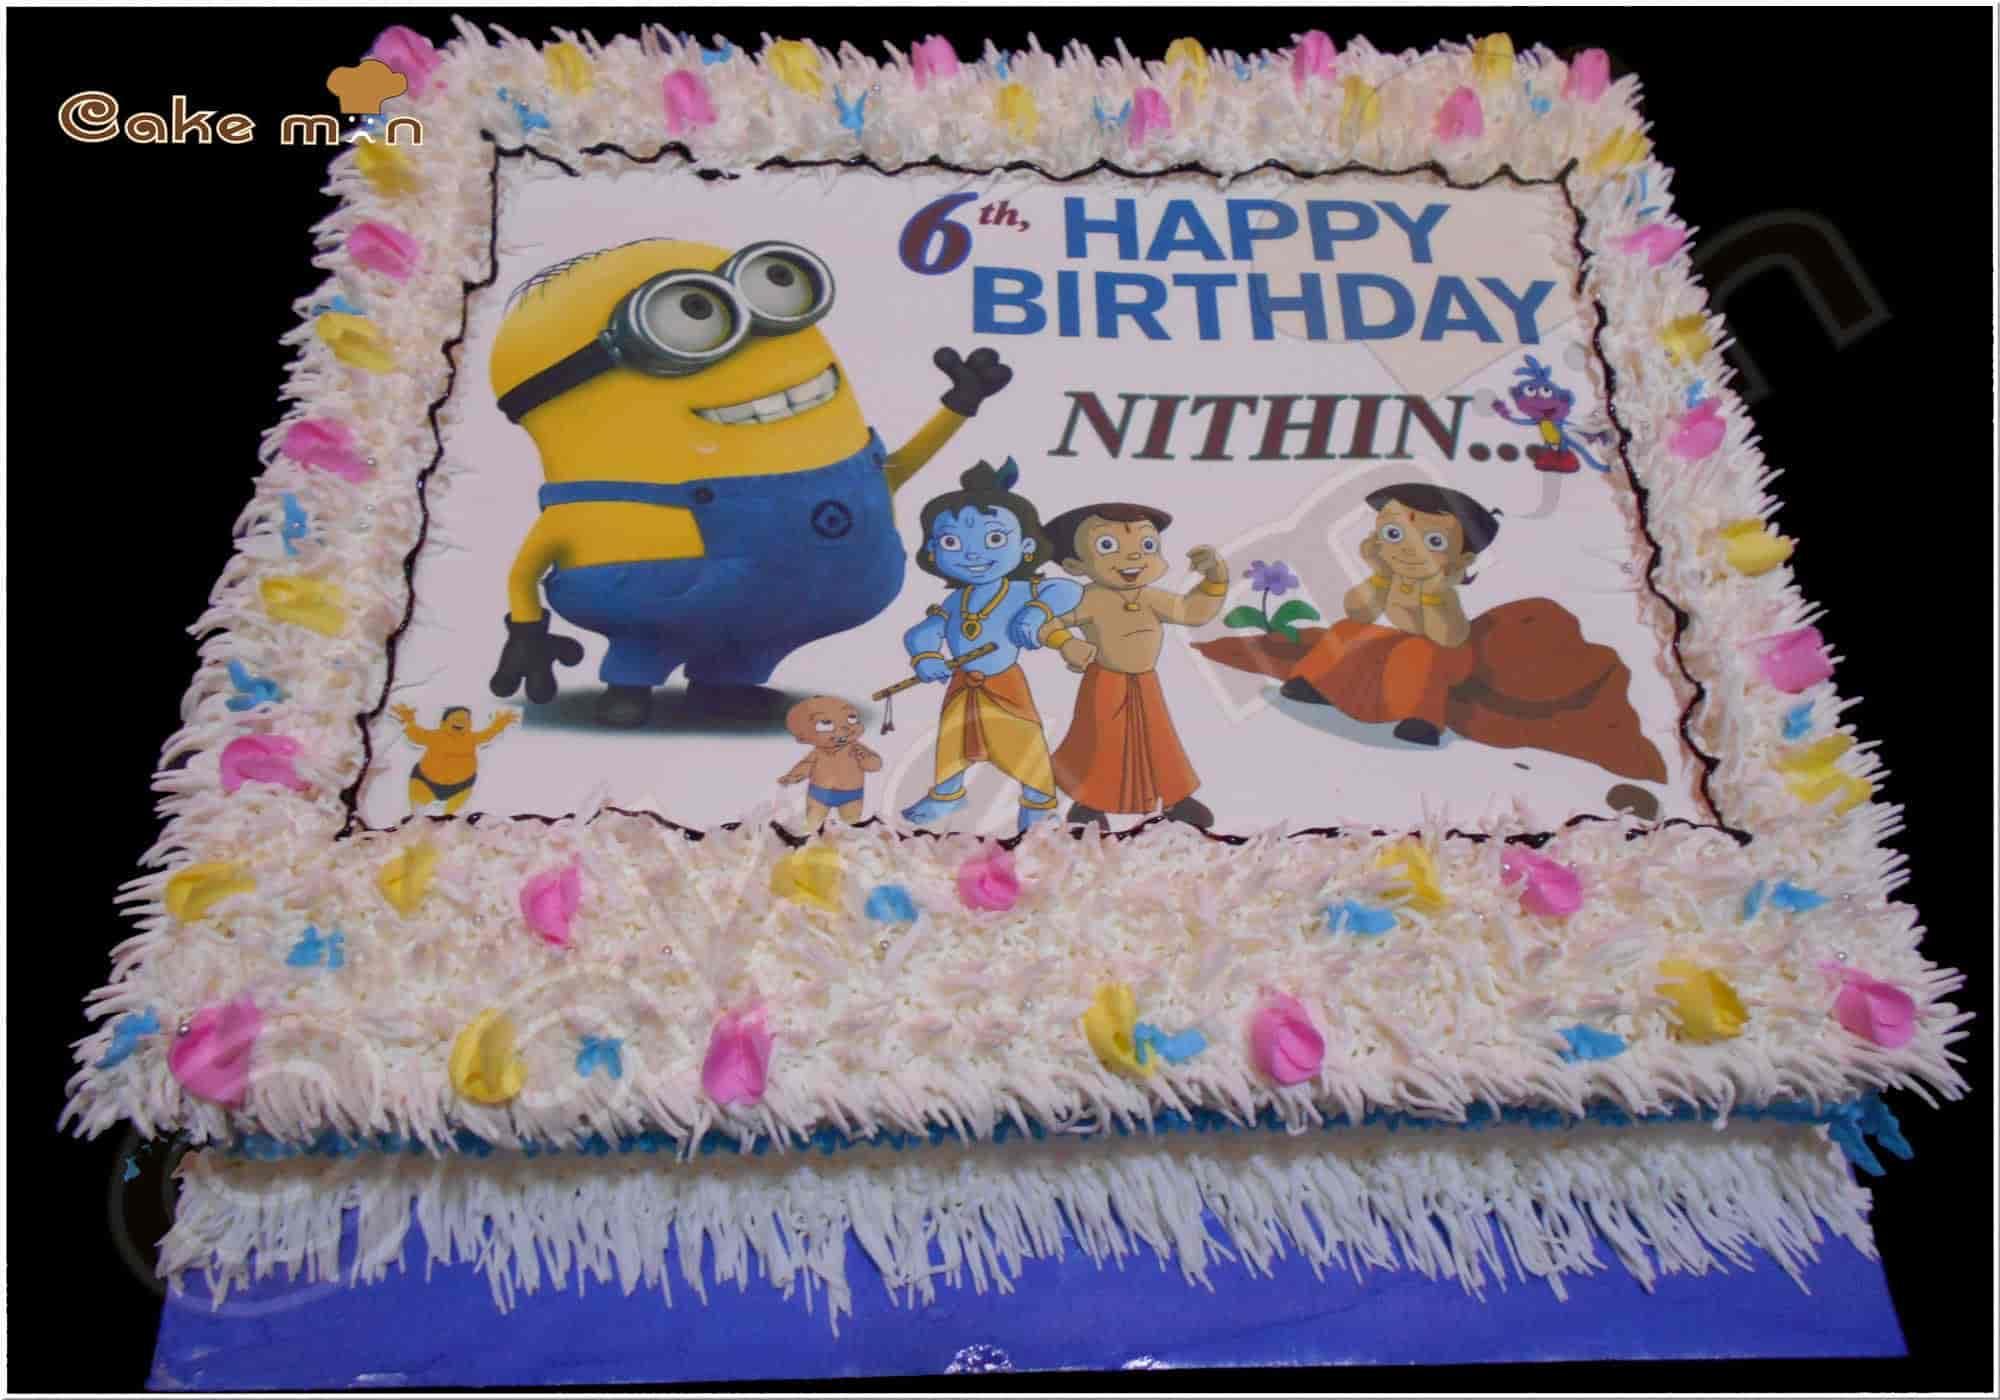 Enjoyable Cake Man Saravanampatti Coimbatore Cake Shops Justdial Funny Birthday Cards Online Elaedamsfinfo